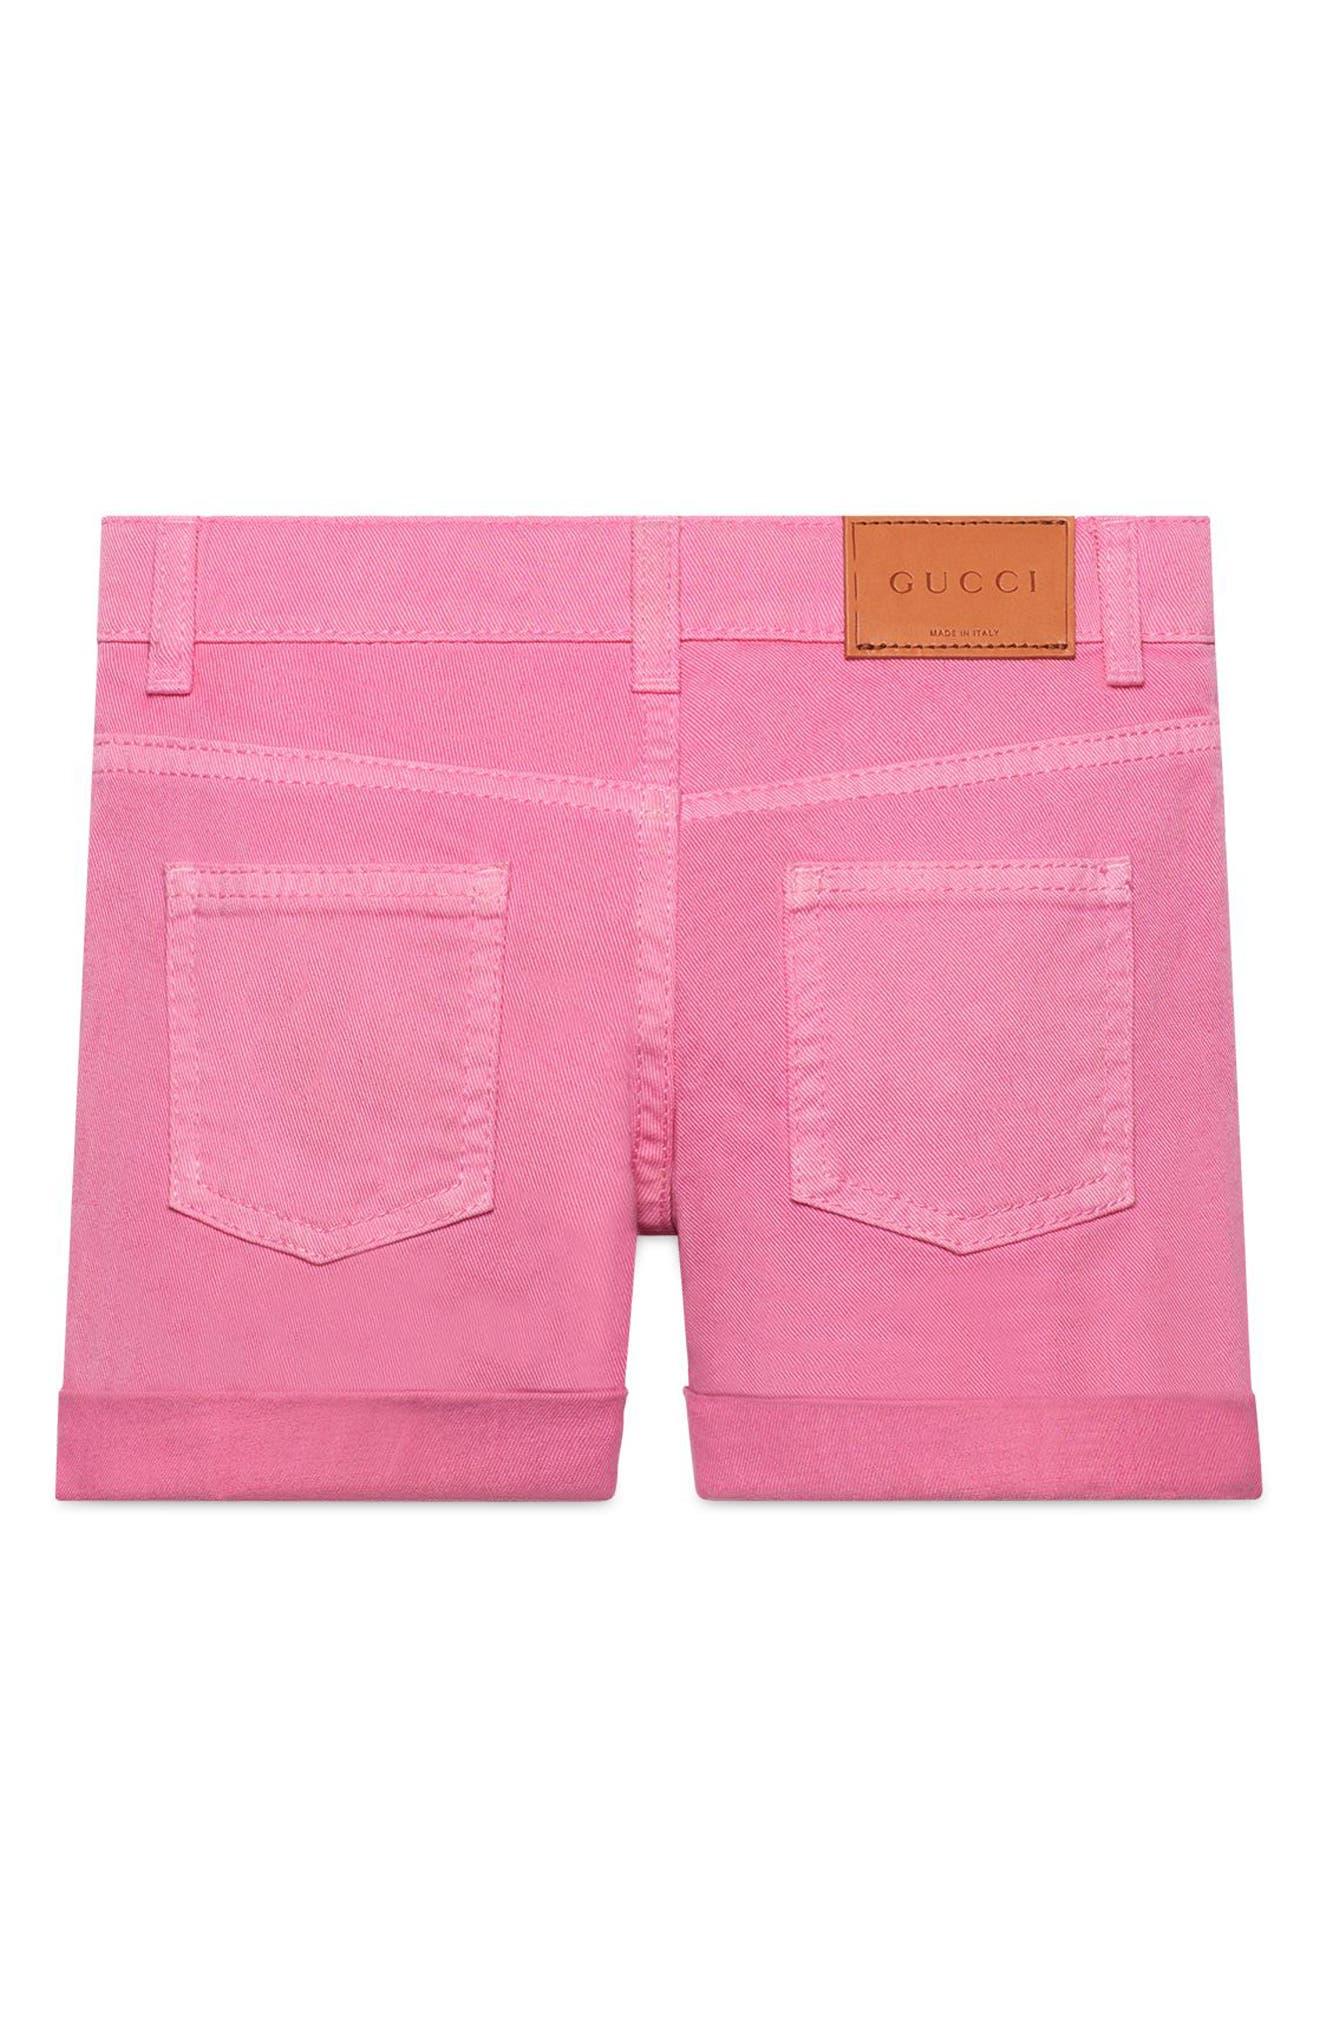 Pink Denim Cuffed Shorts,                             Alternate thumbnail 2, color,                             COPPER/ ROSE